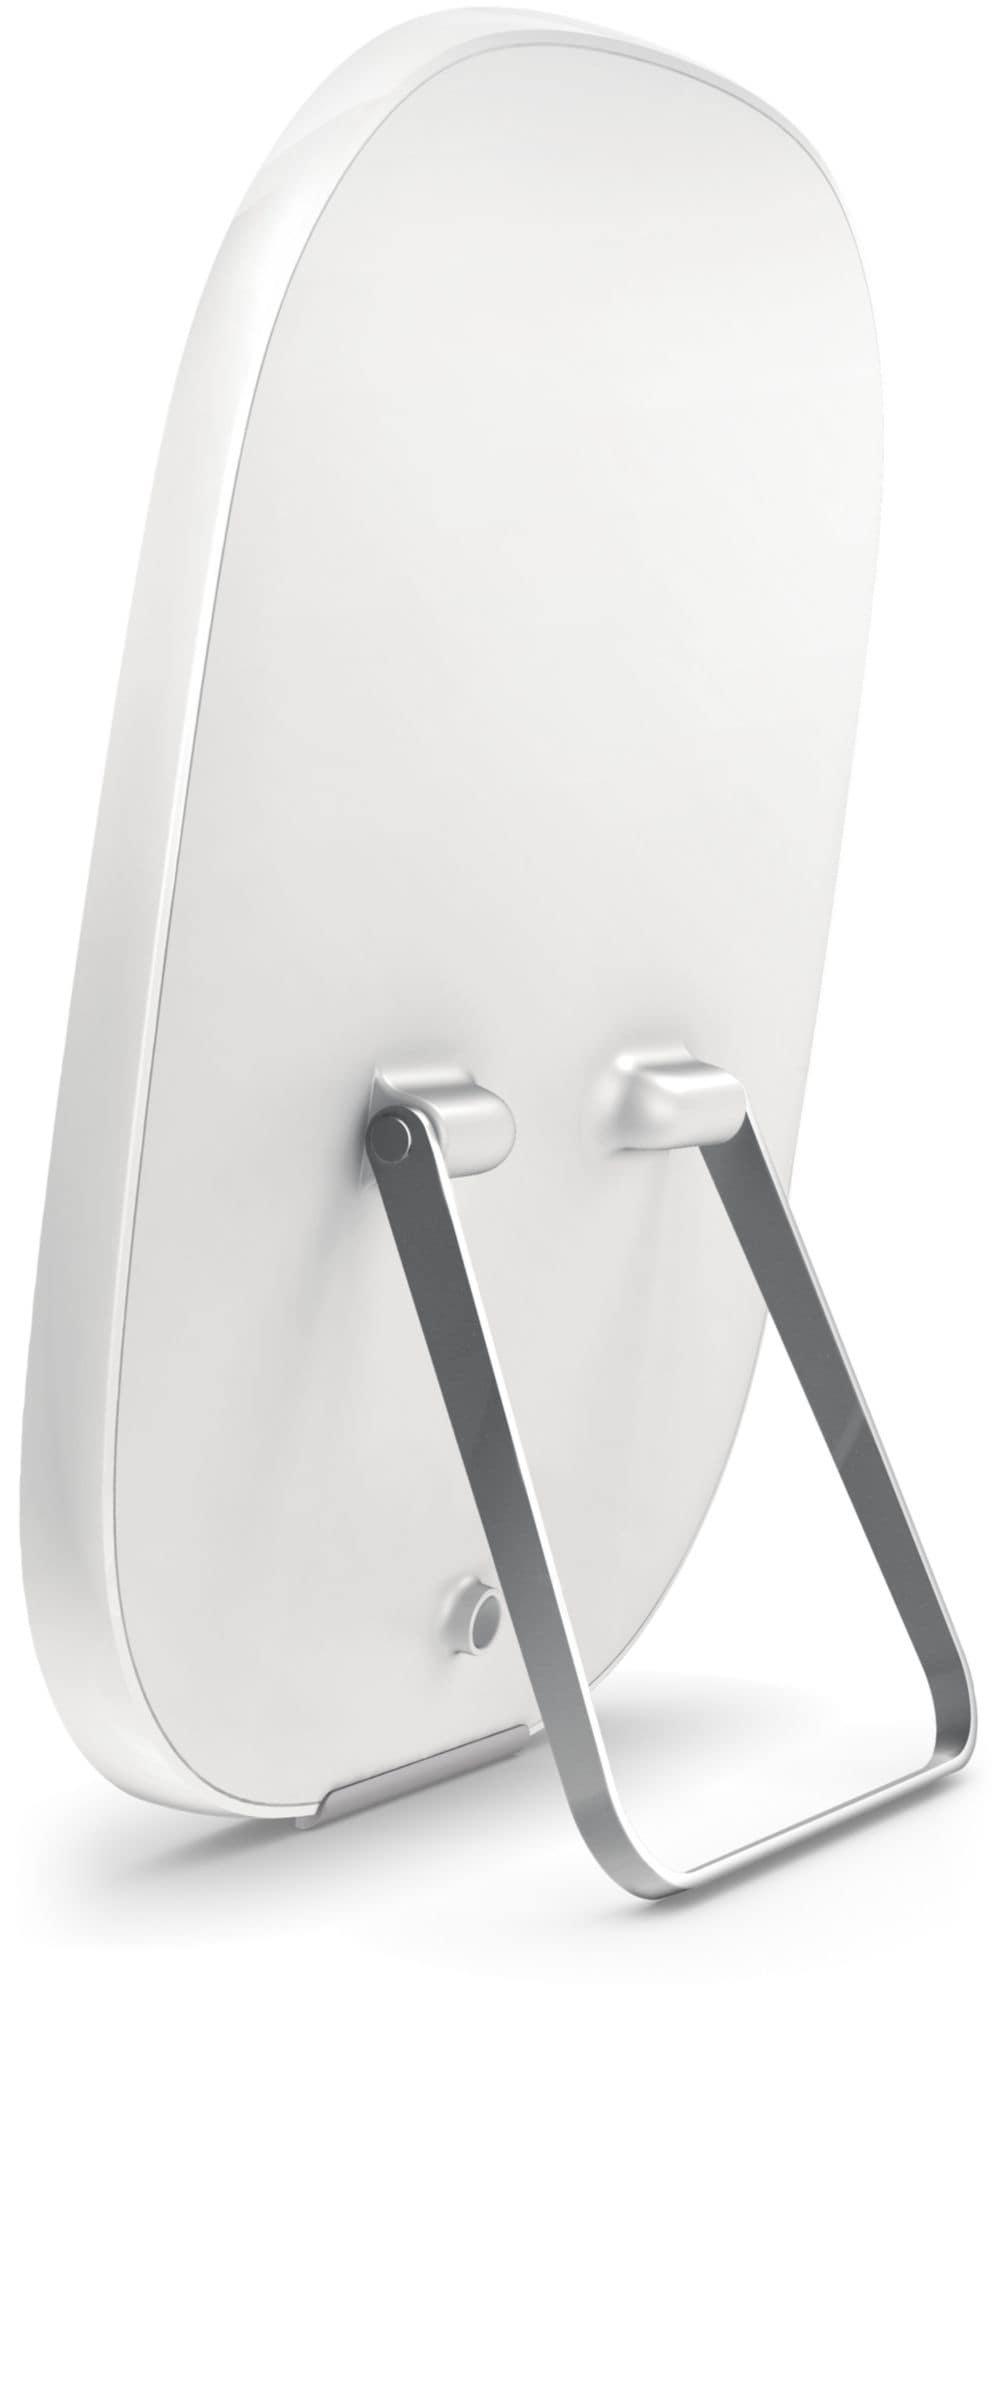 Philips EnergyUp EnergyLight für 175,99 Euro